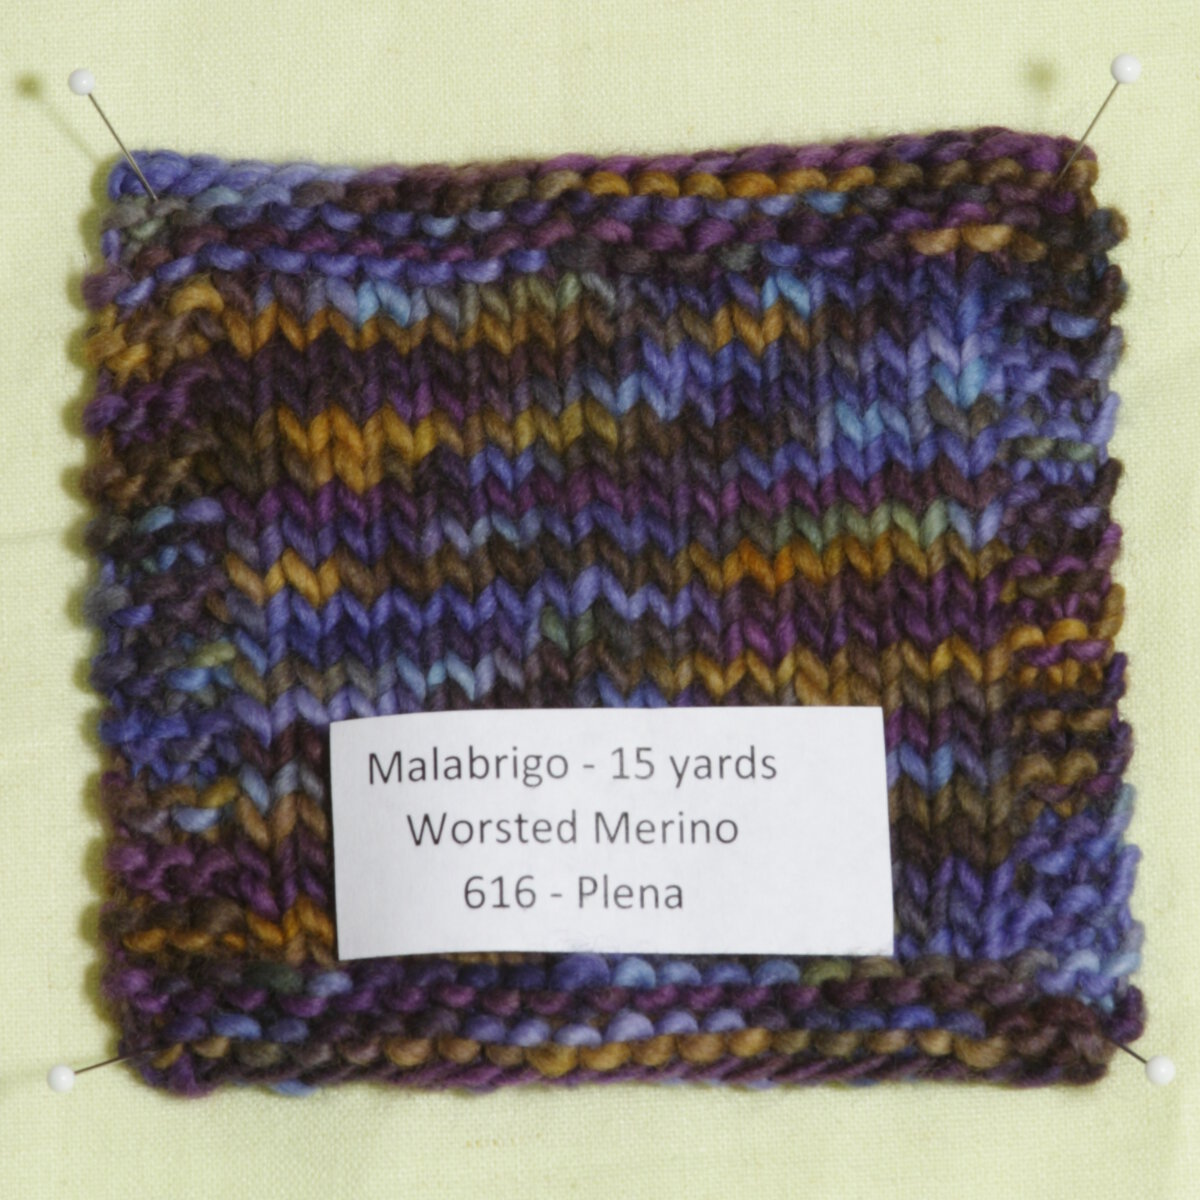 Malabrigo Worsted Merino Yarn 616 Plena At Jimmy Beans Wool